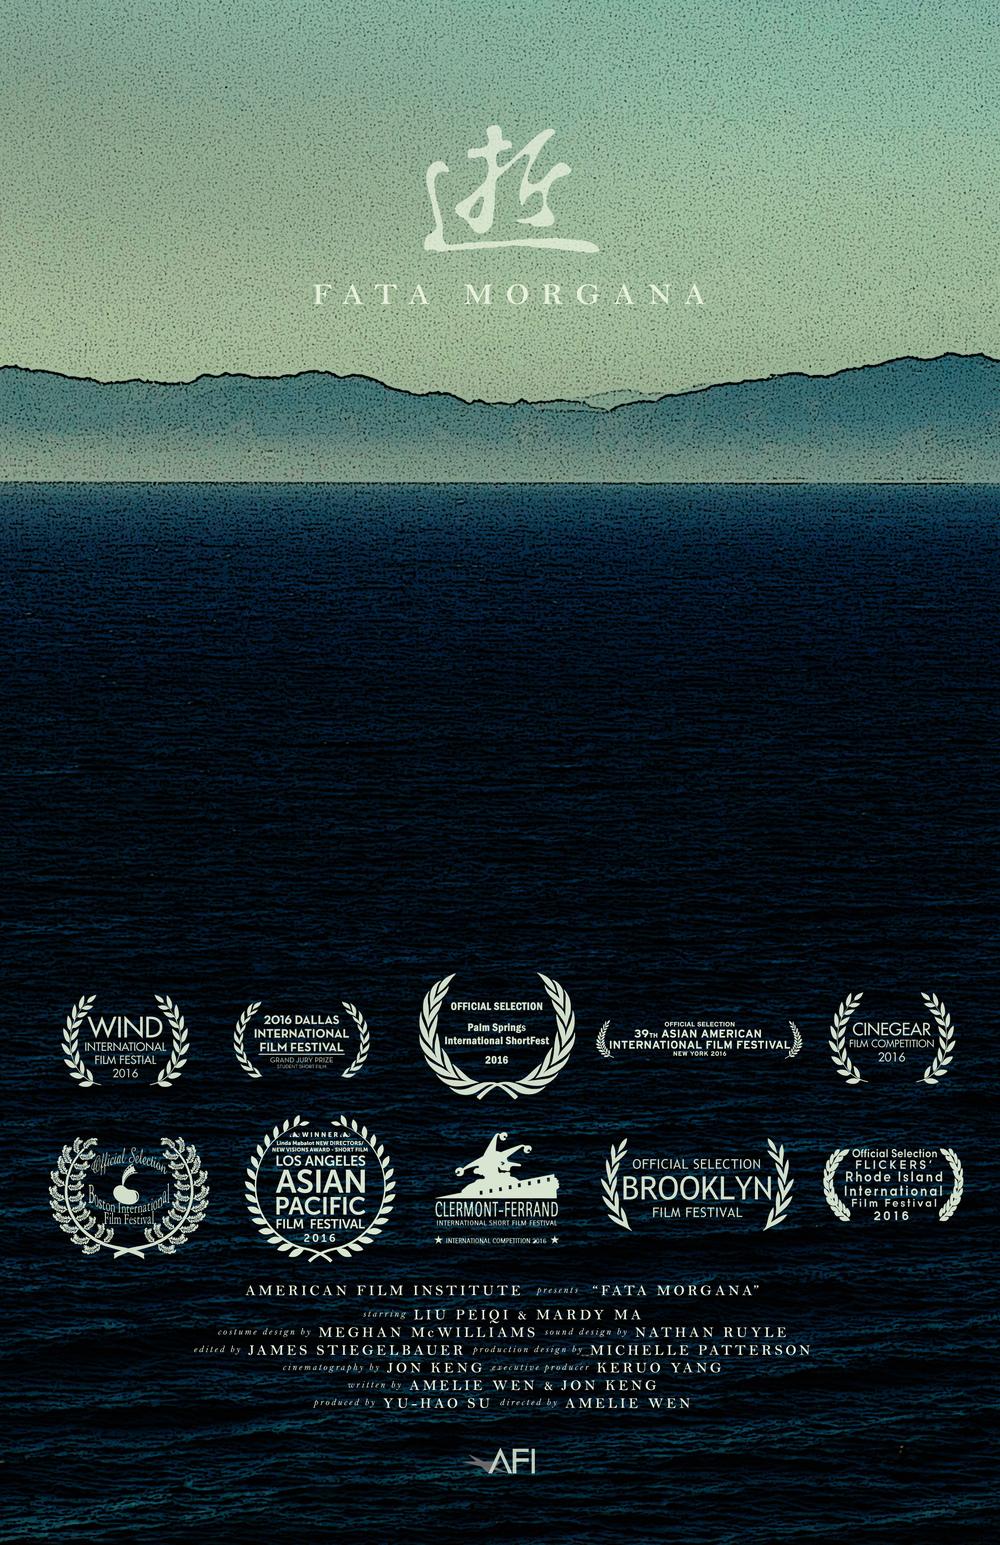 FATA MORGANA_poster 06202016.jpg